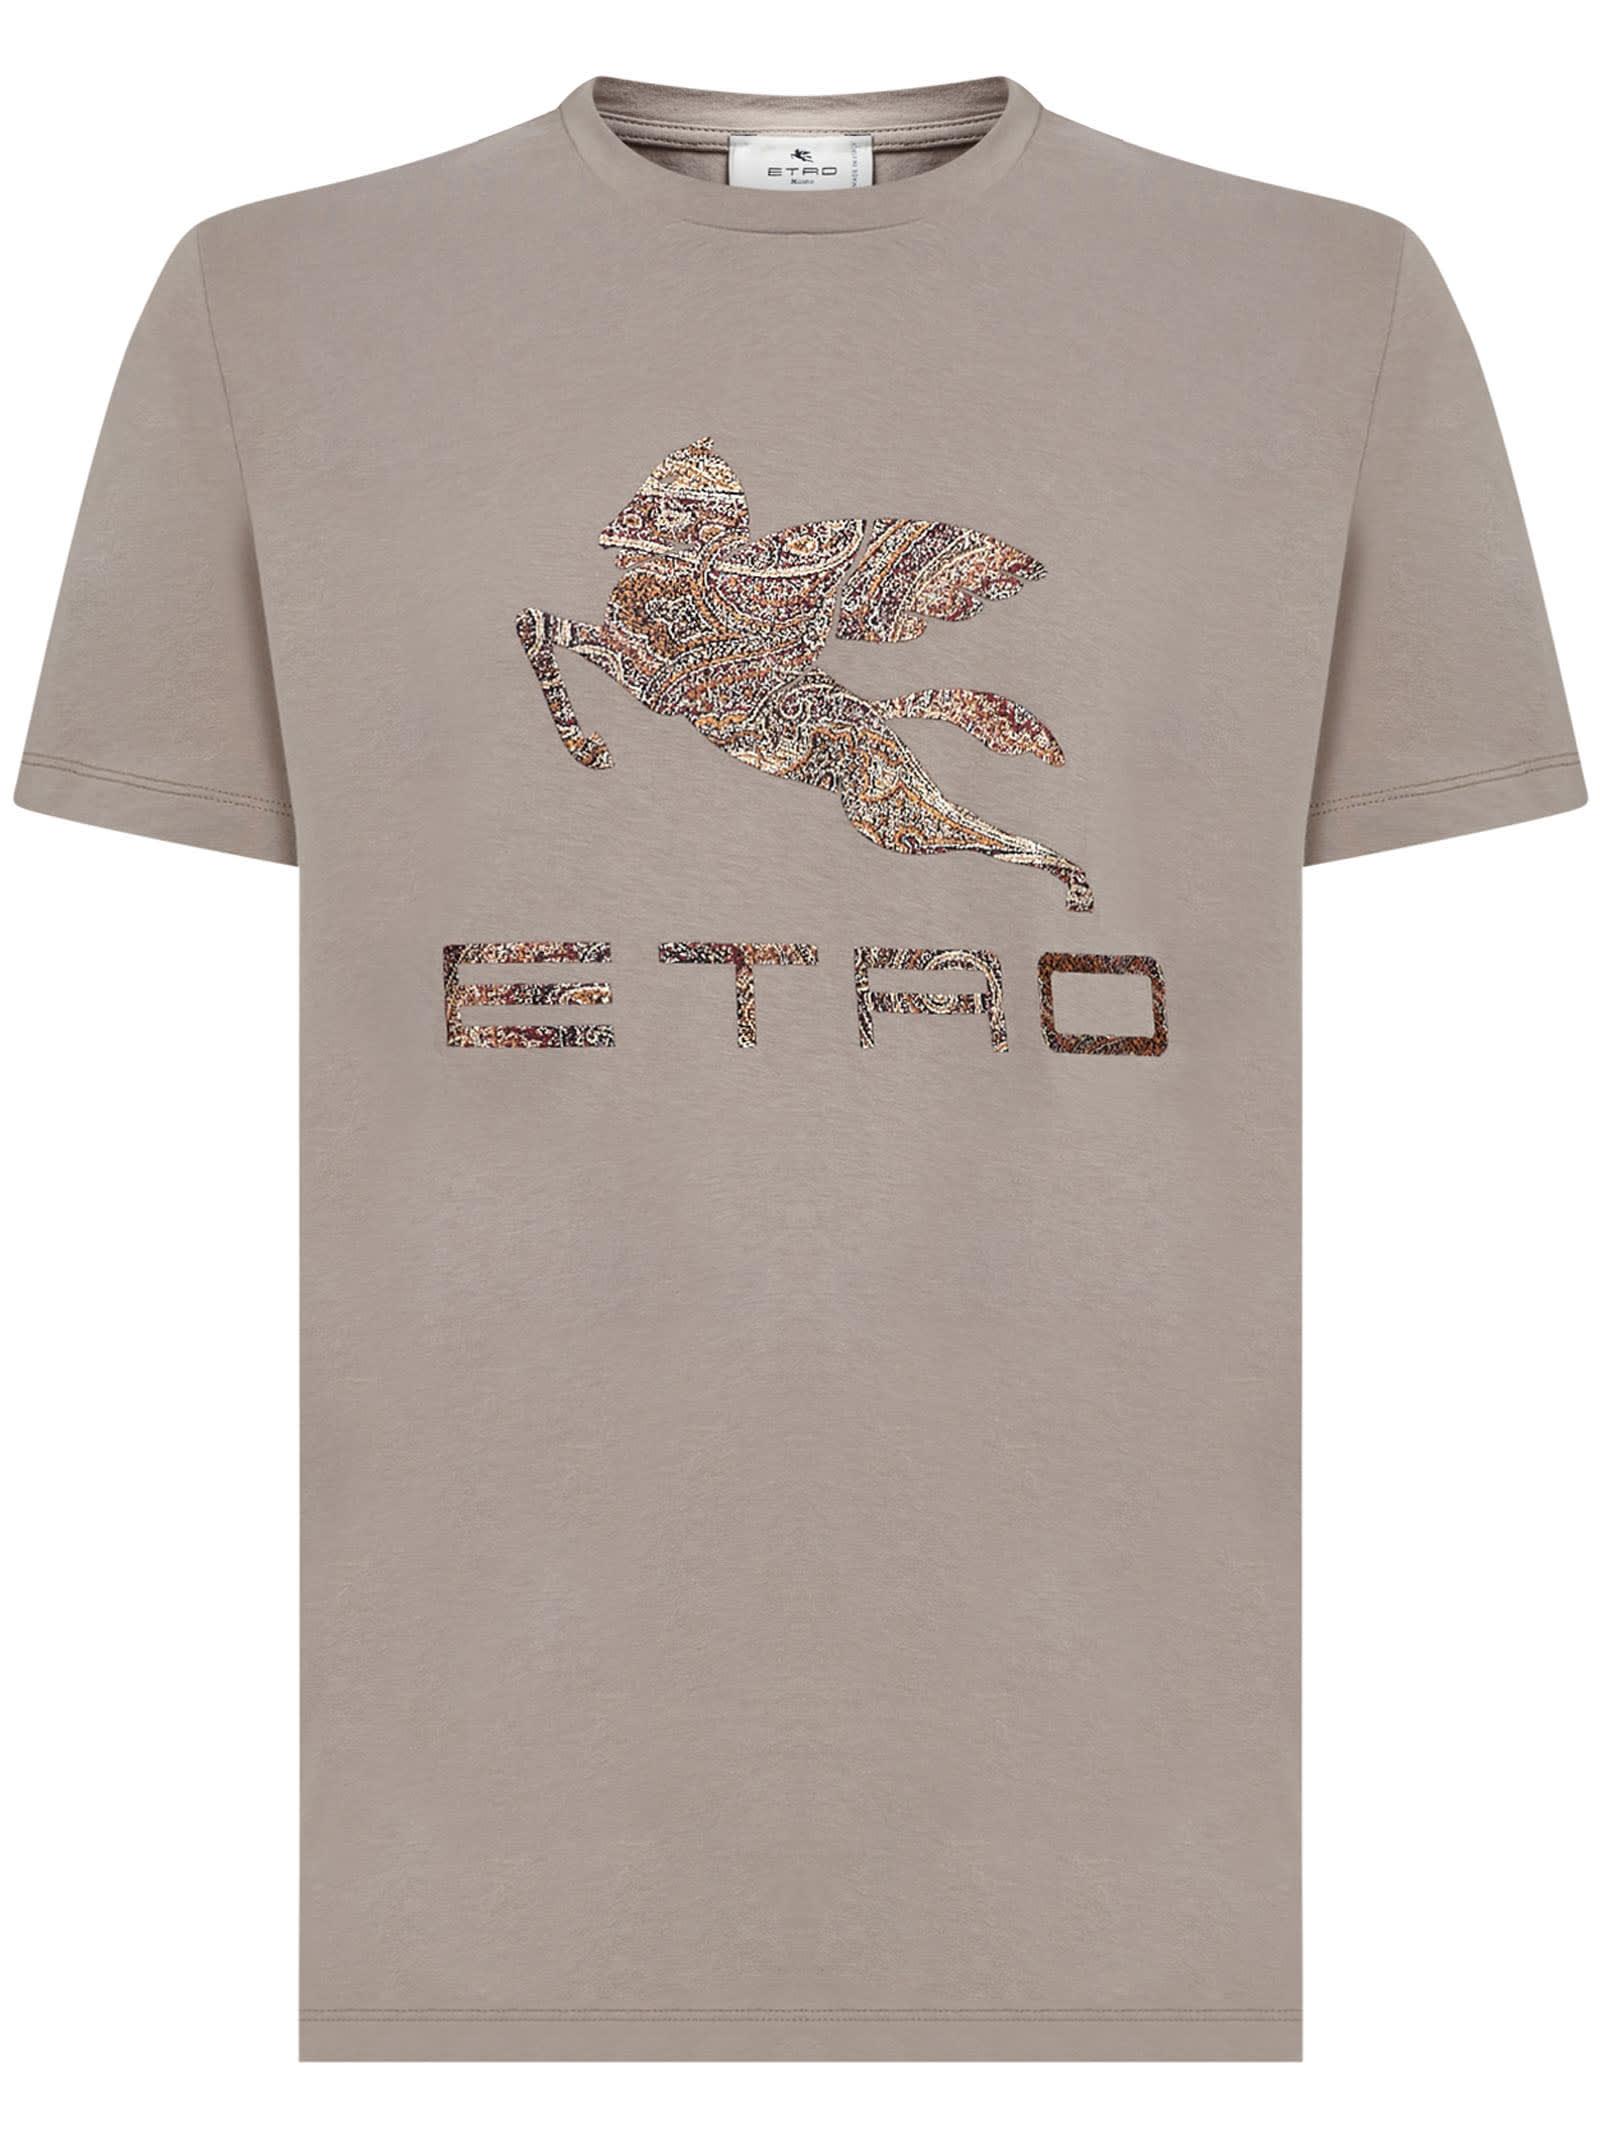 Etro Cottons T-SHIRT